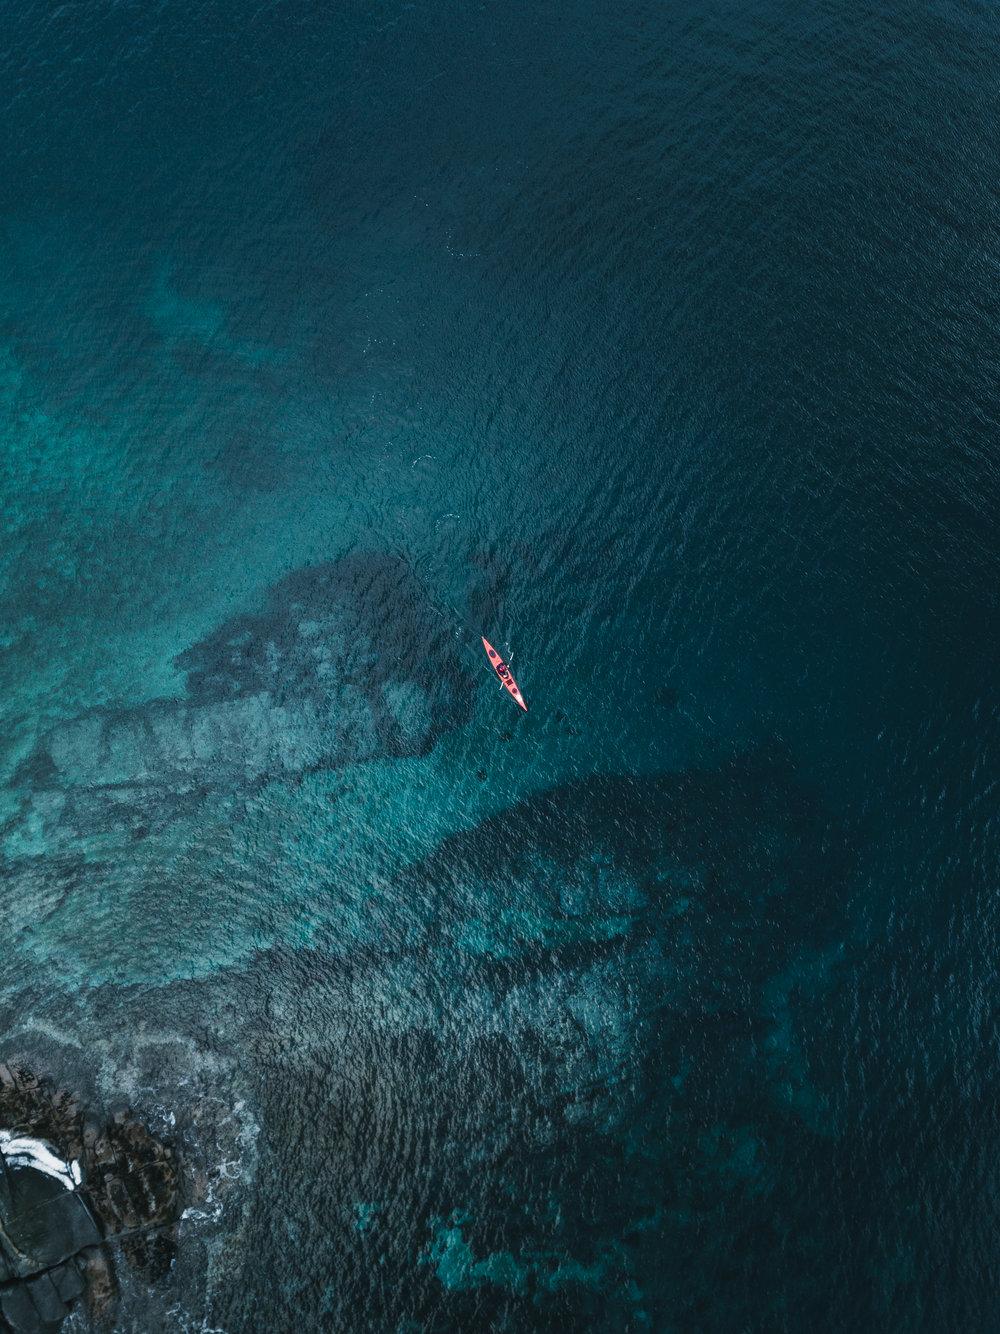 Kayak in Senja by Mads Nordsveen - Photography.jpg